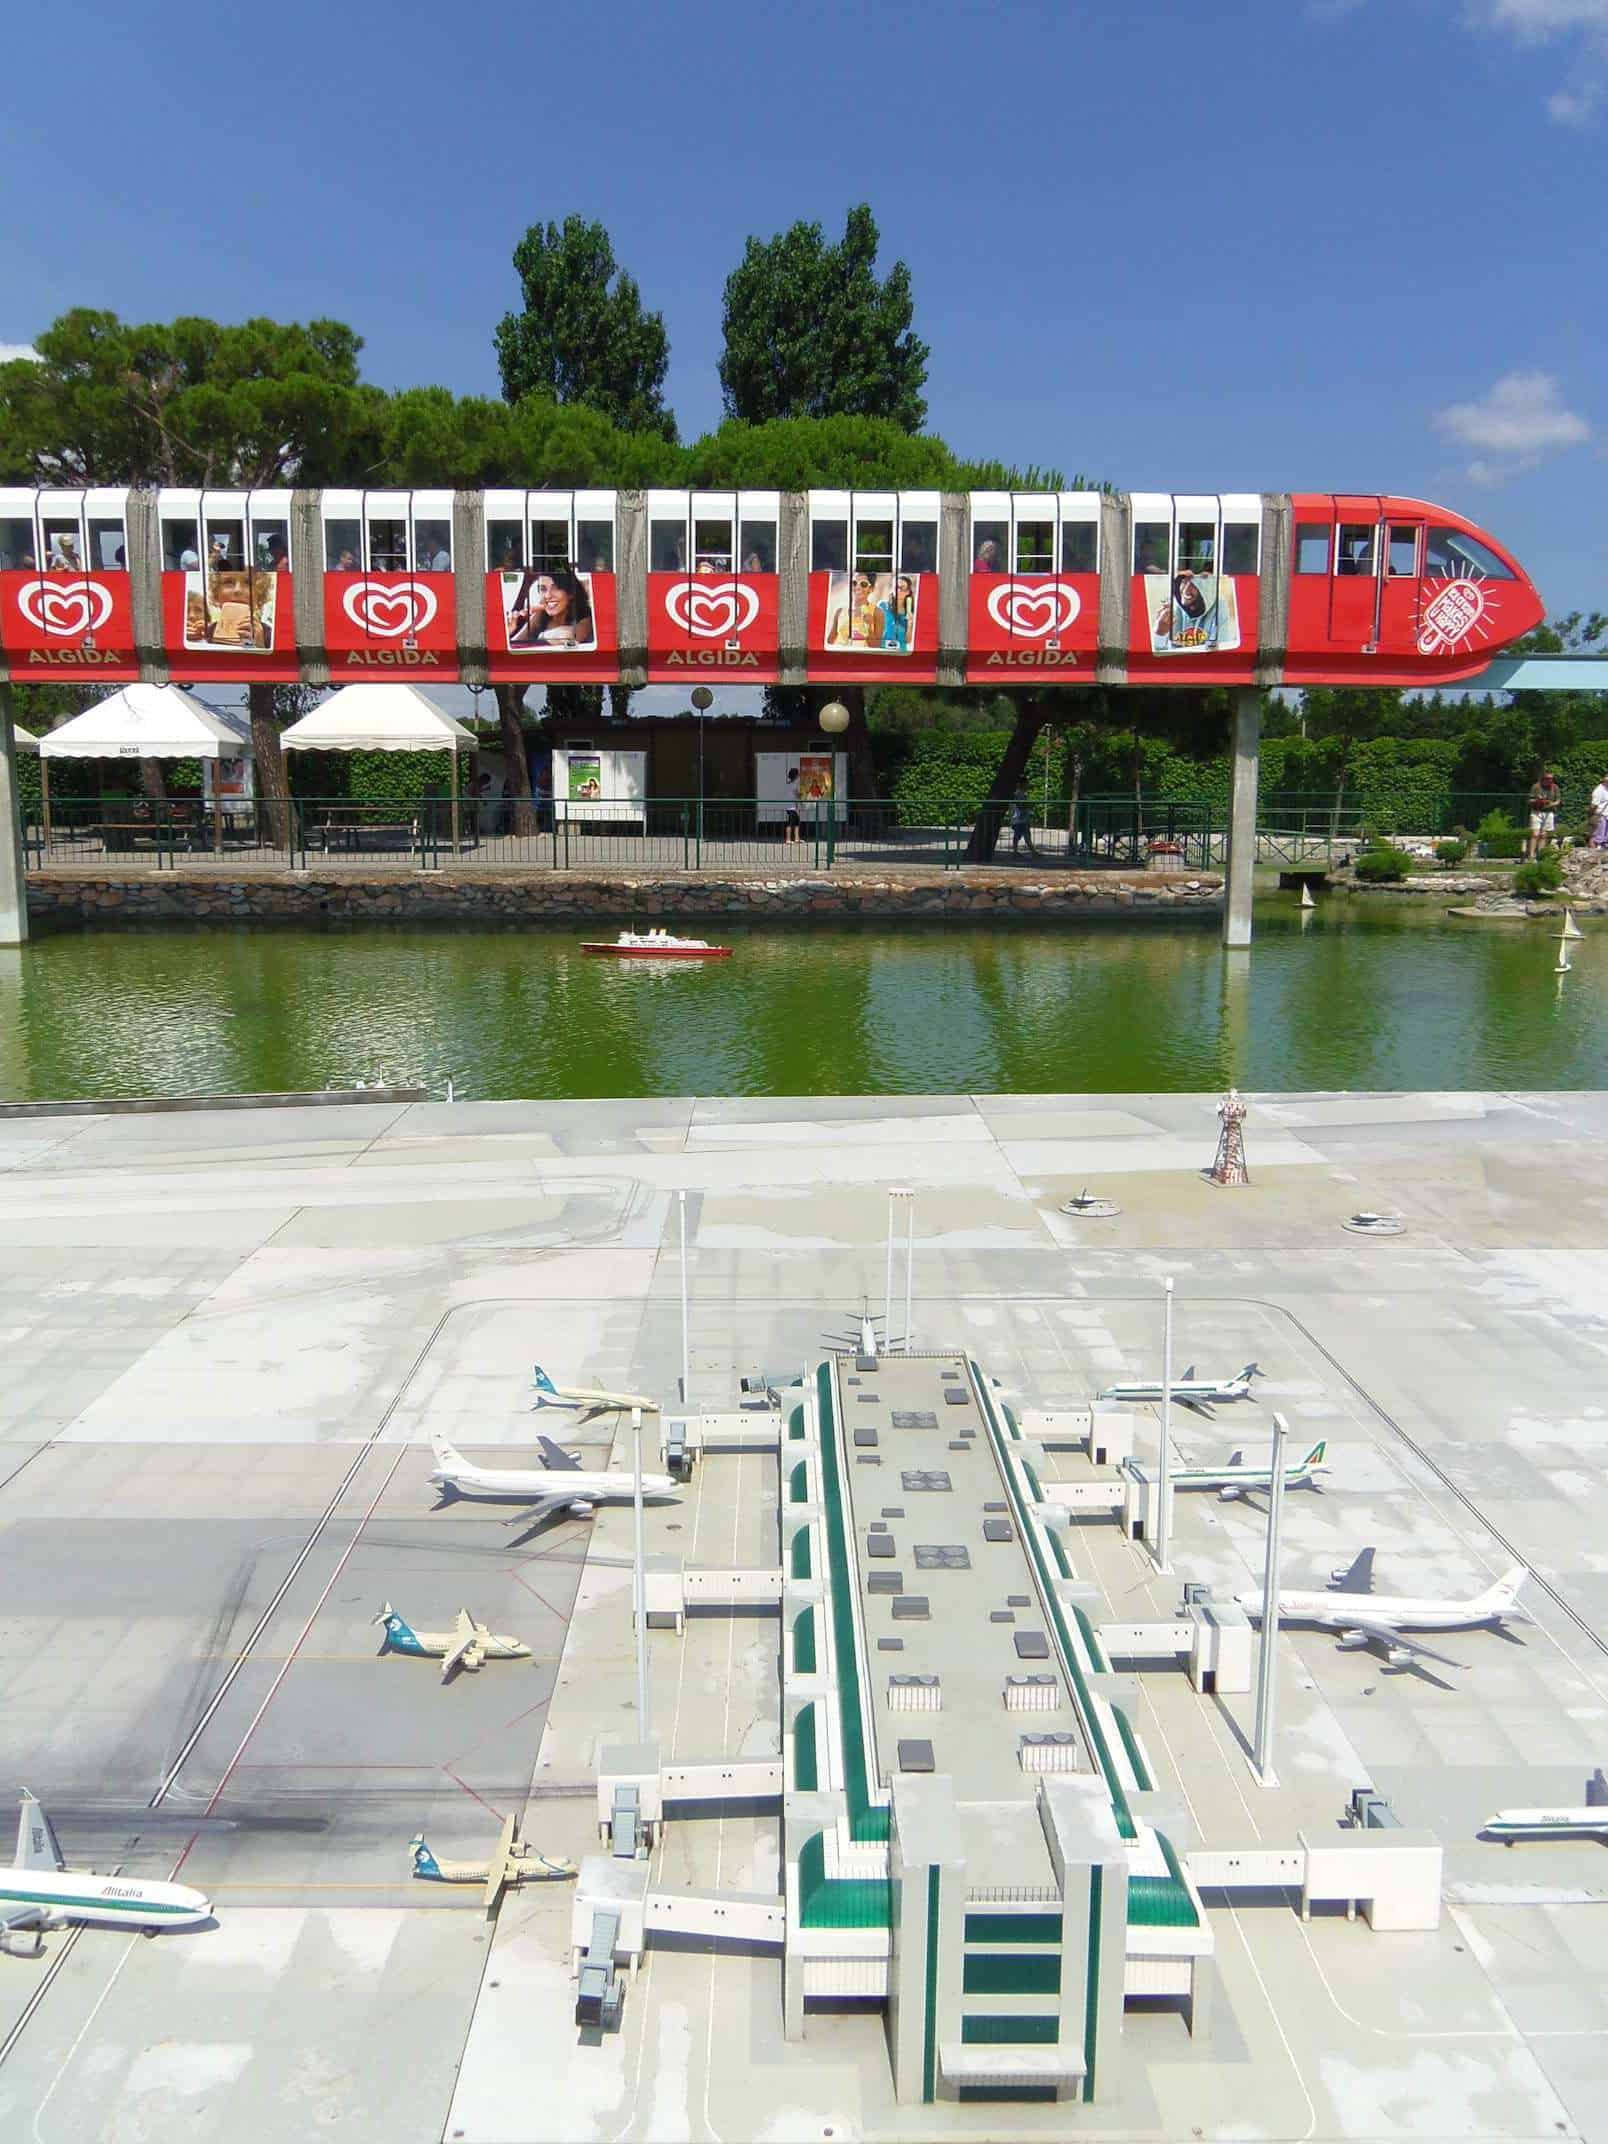 Monorail Rimini